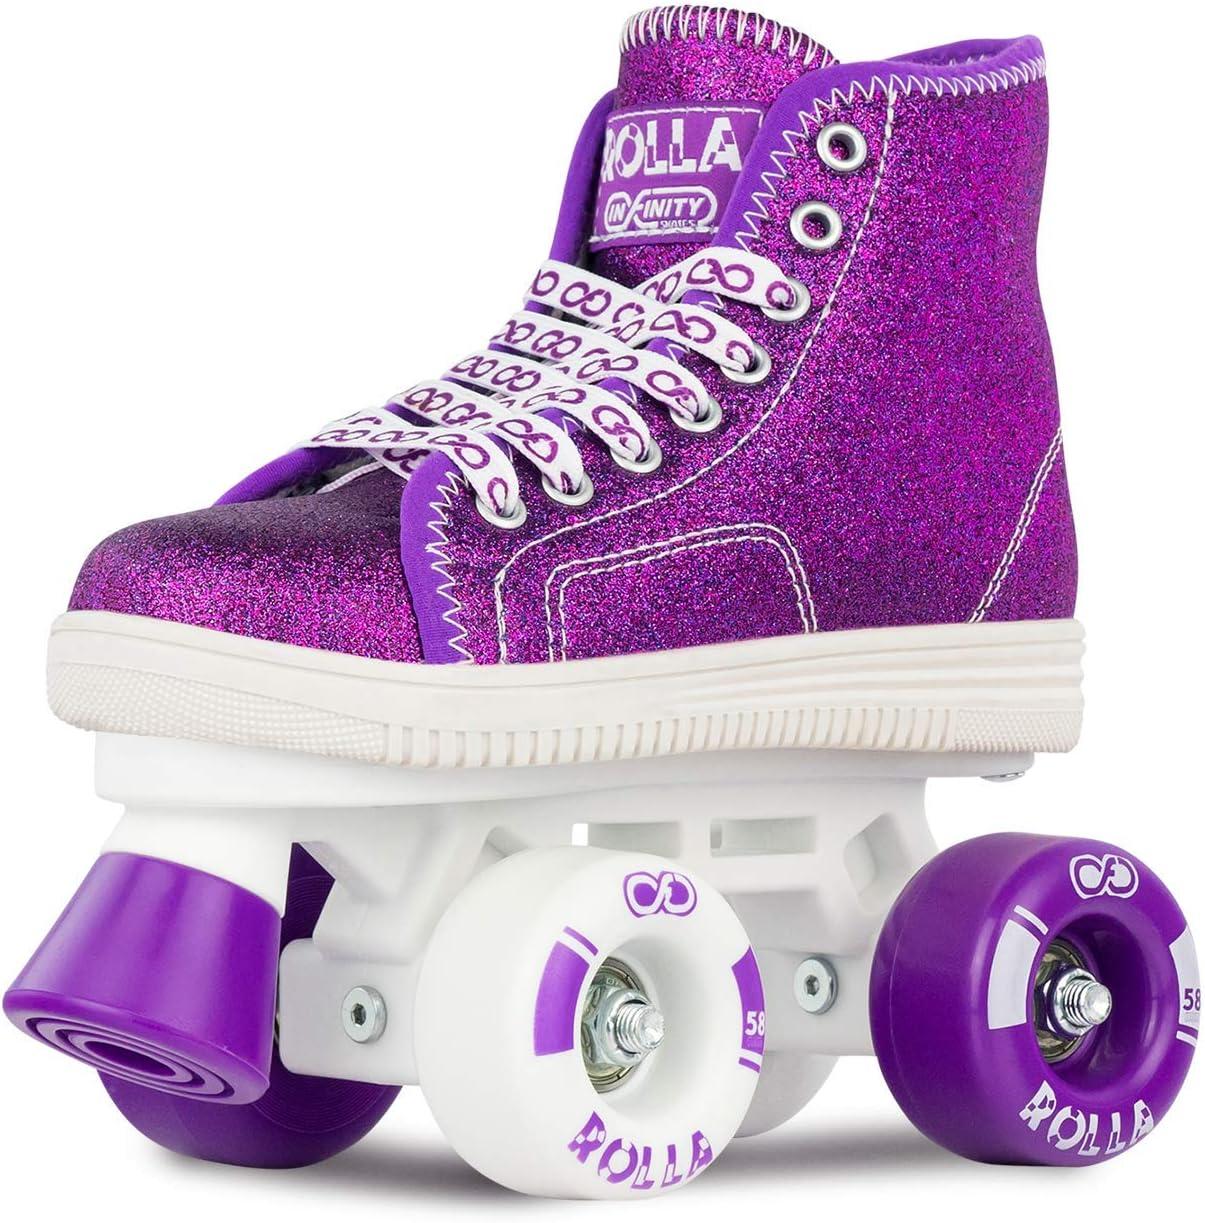 Great Beginner Kids Quad Skates Crazy Skates Rolla Roller Skates for Boys and Girls